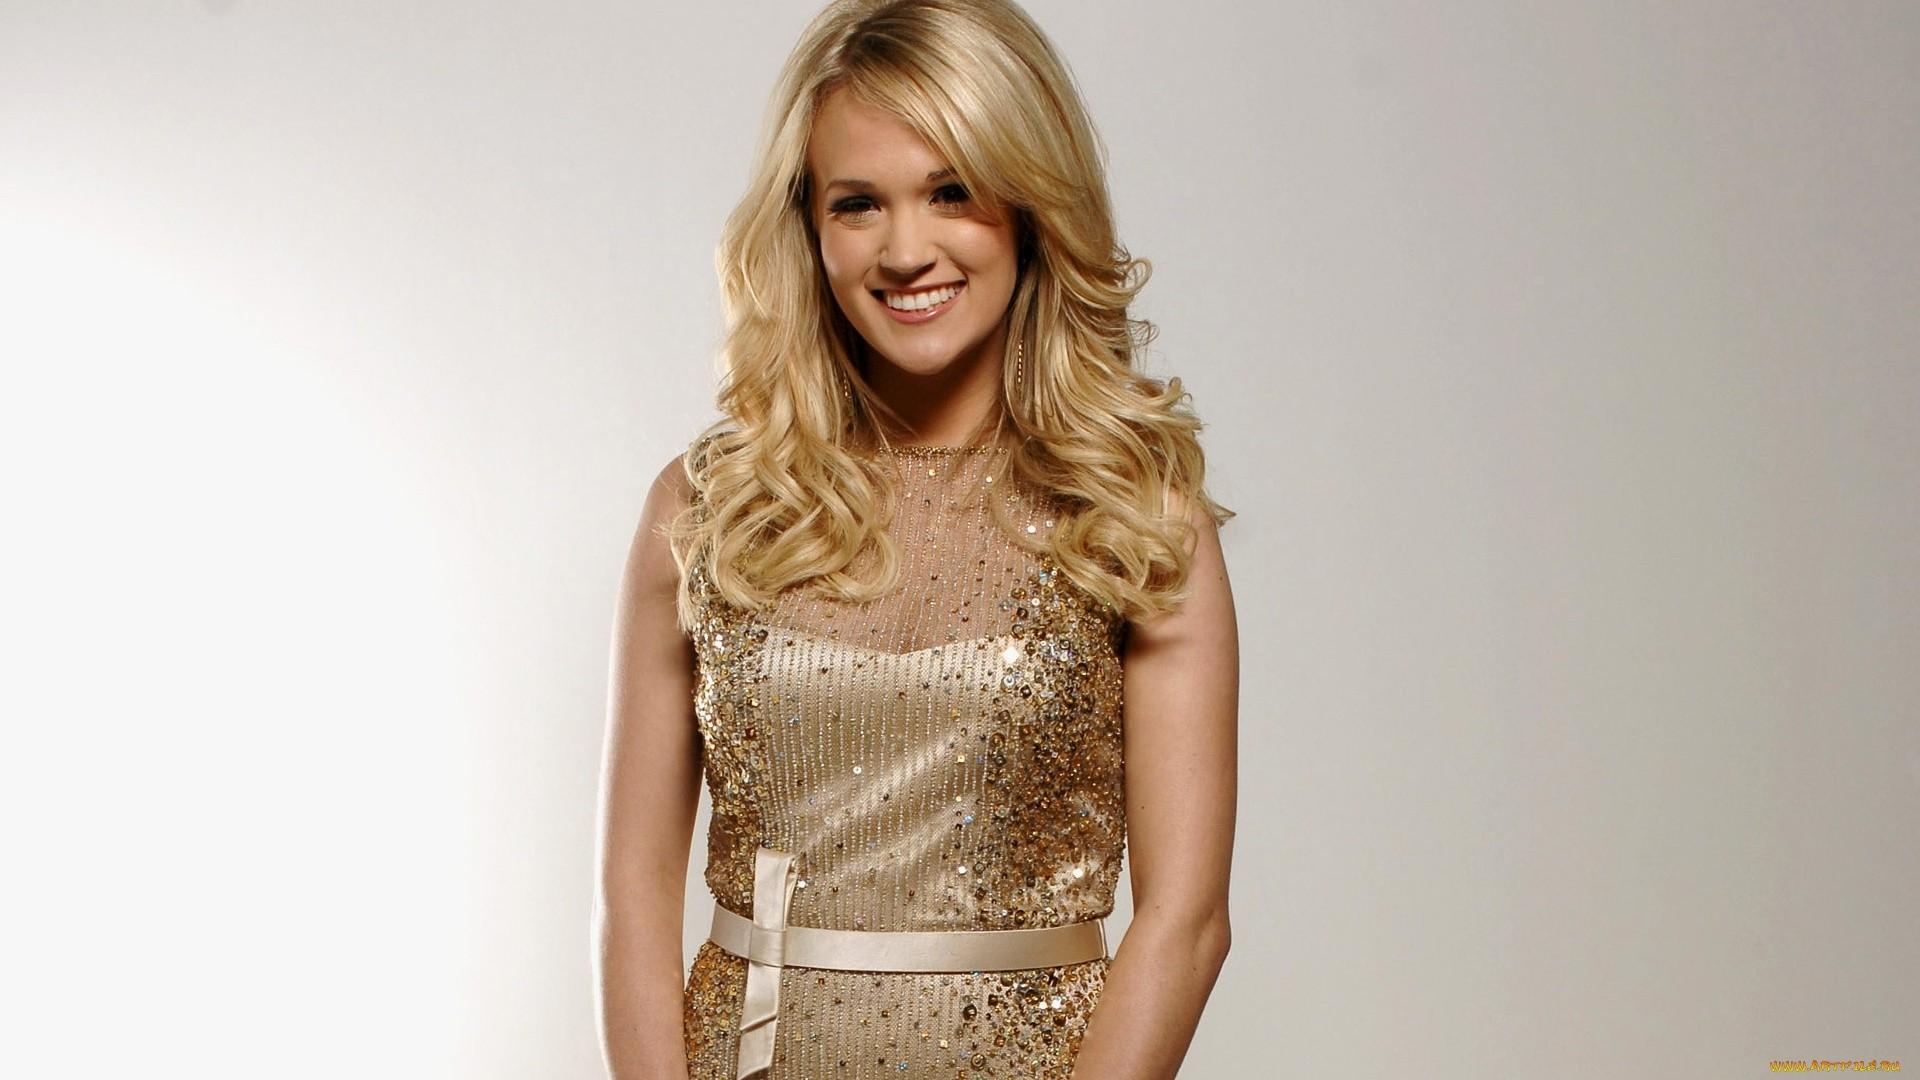 Carrie Underwood wallpaper image hd